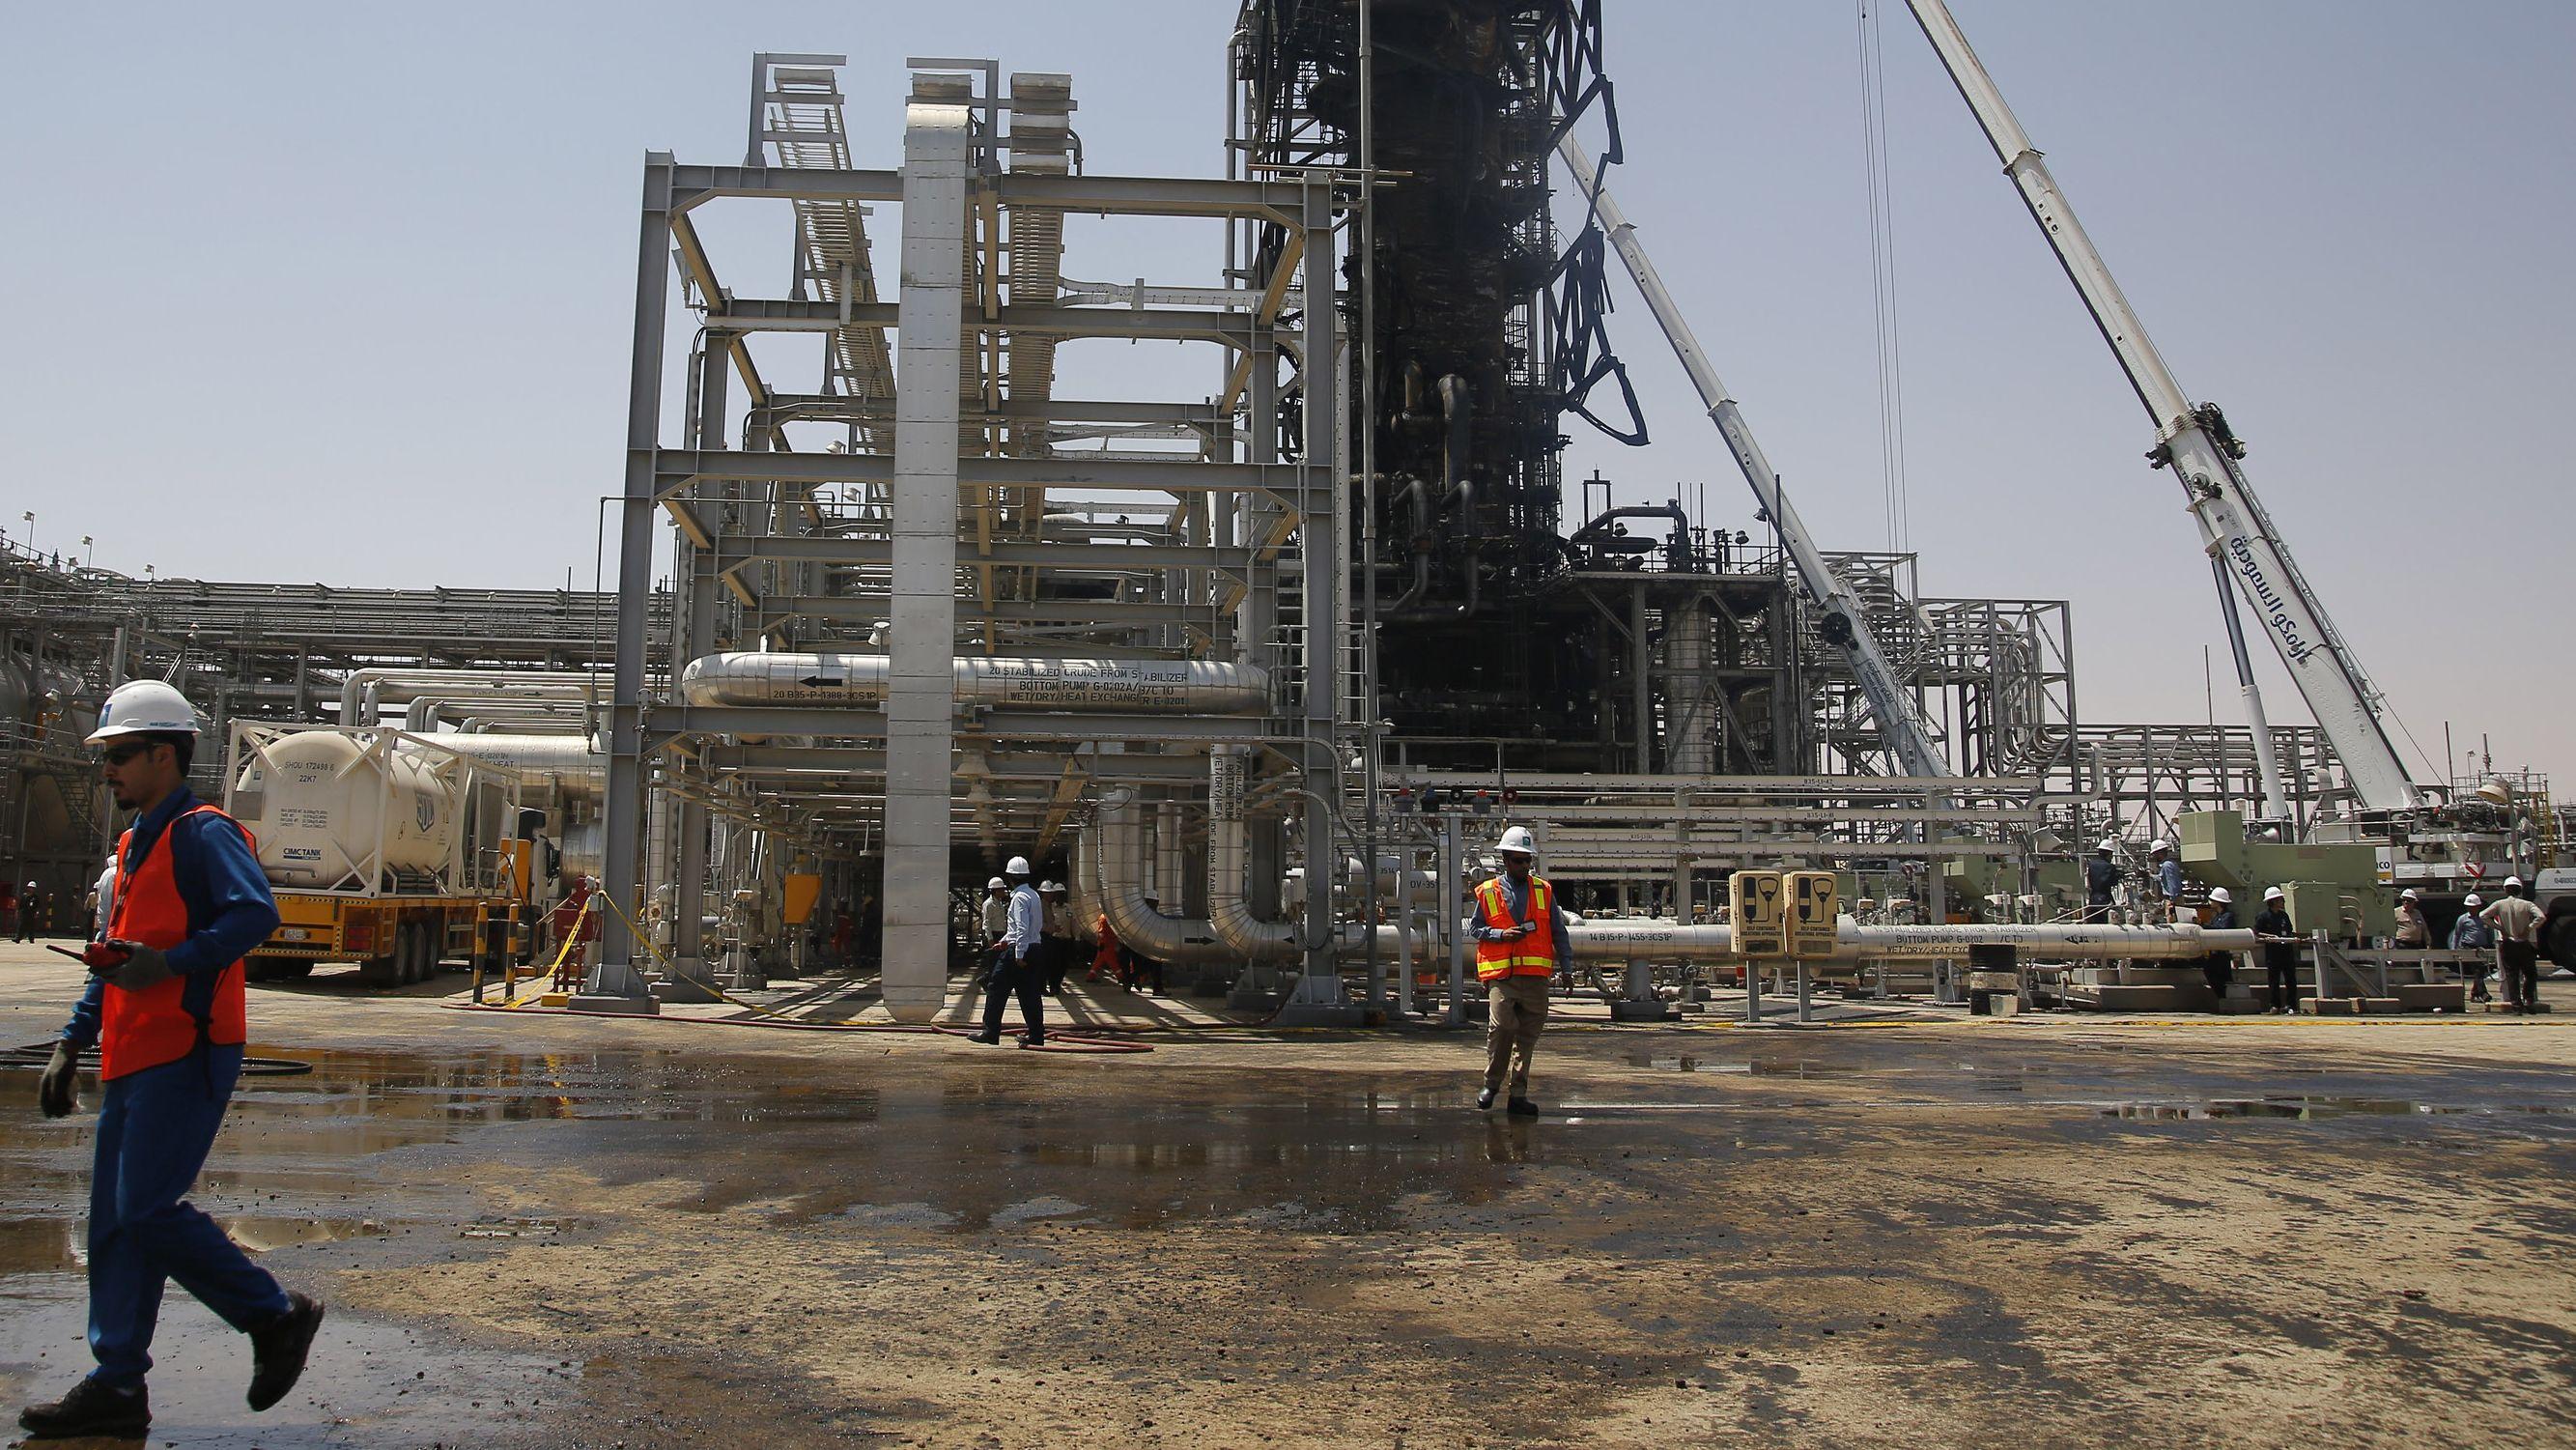 Bombardierte saudische Ölanlage